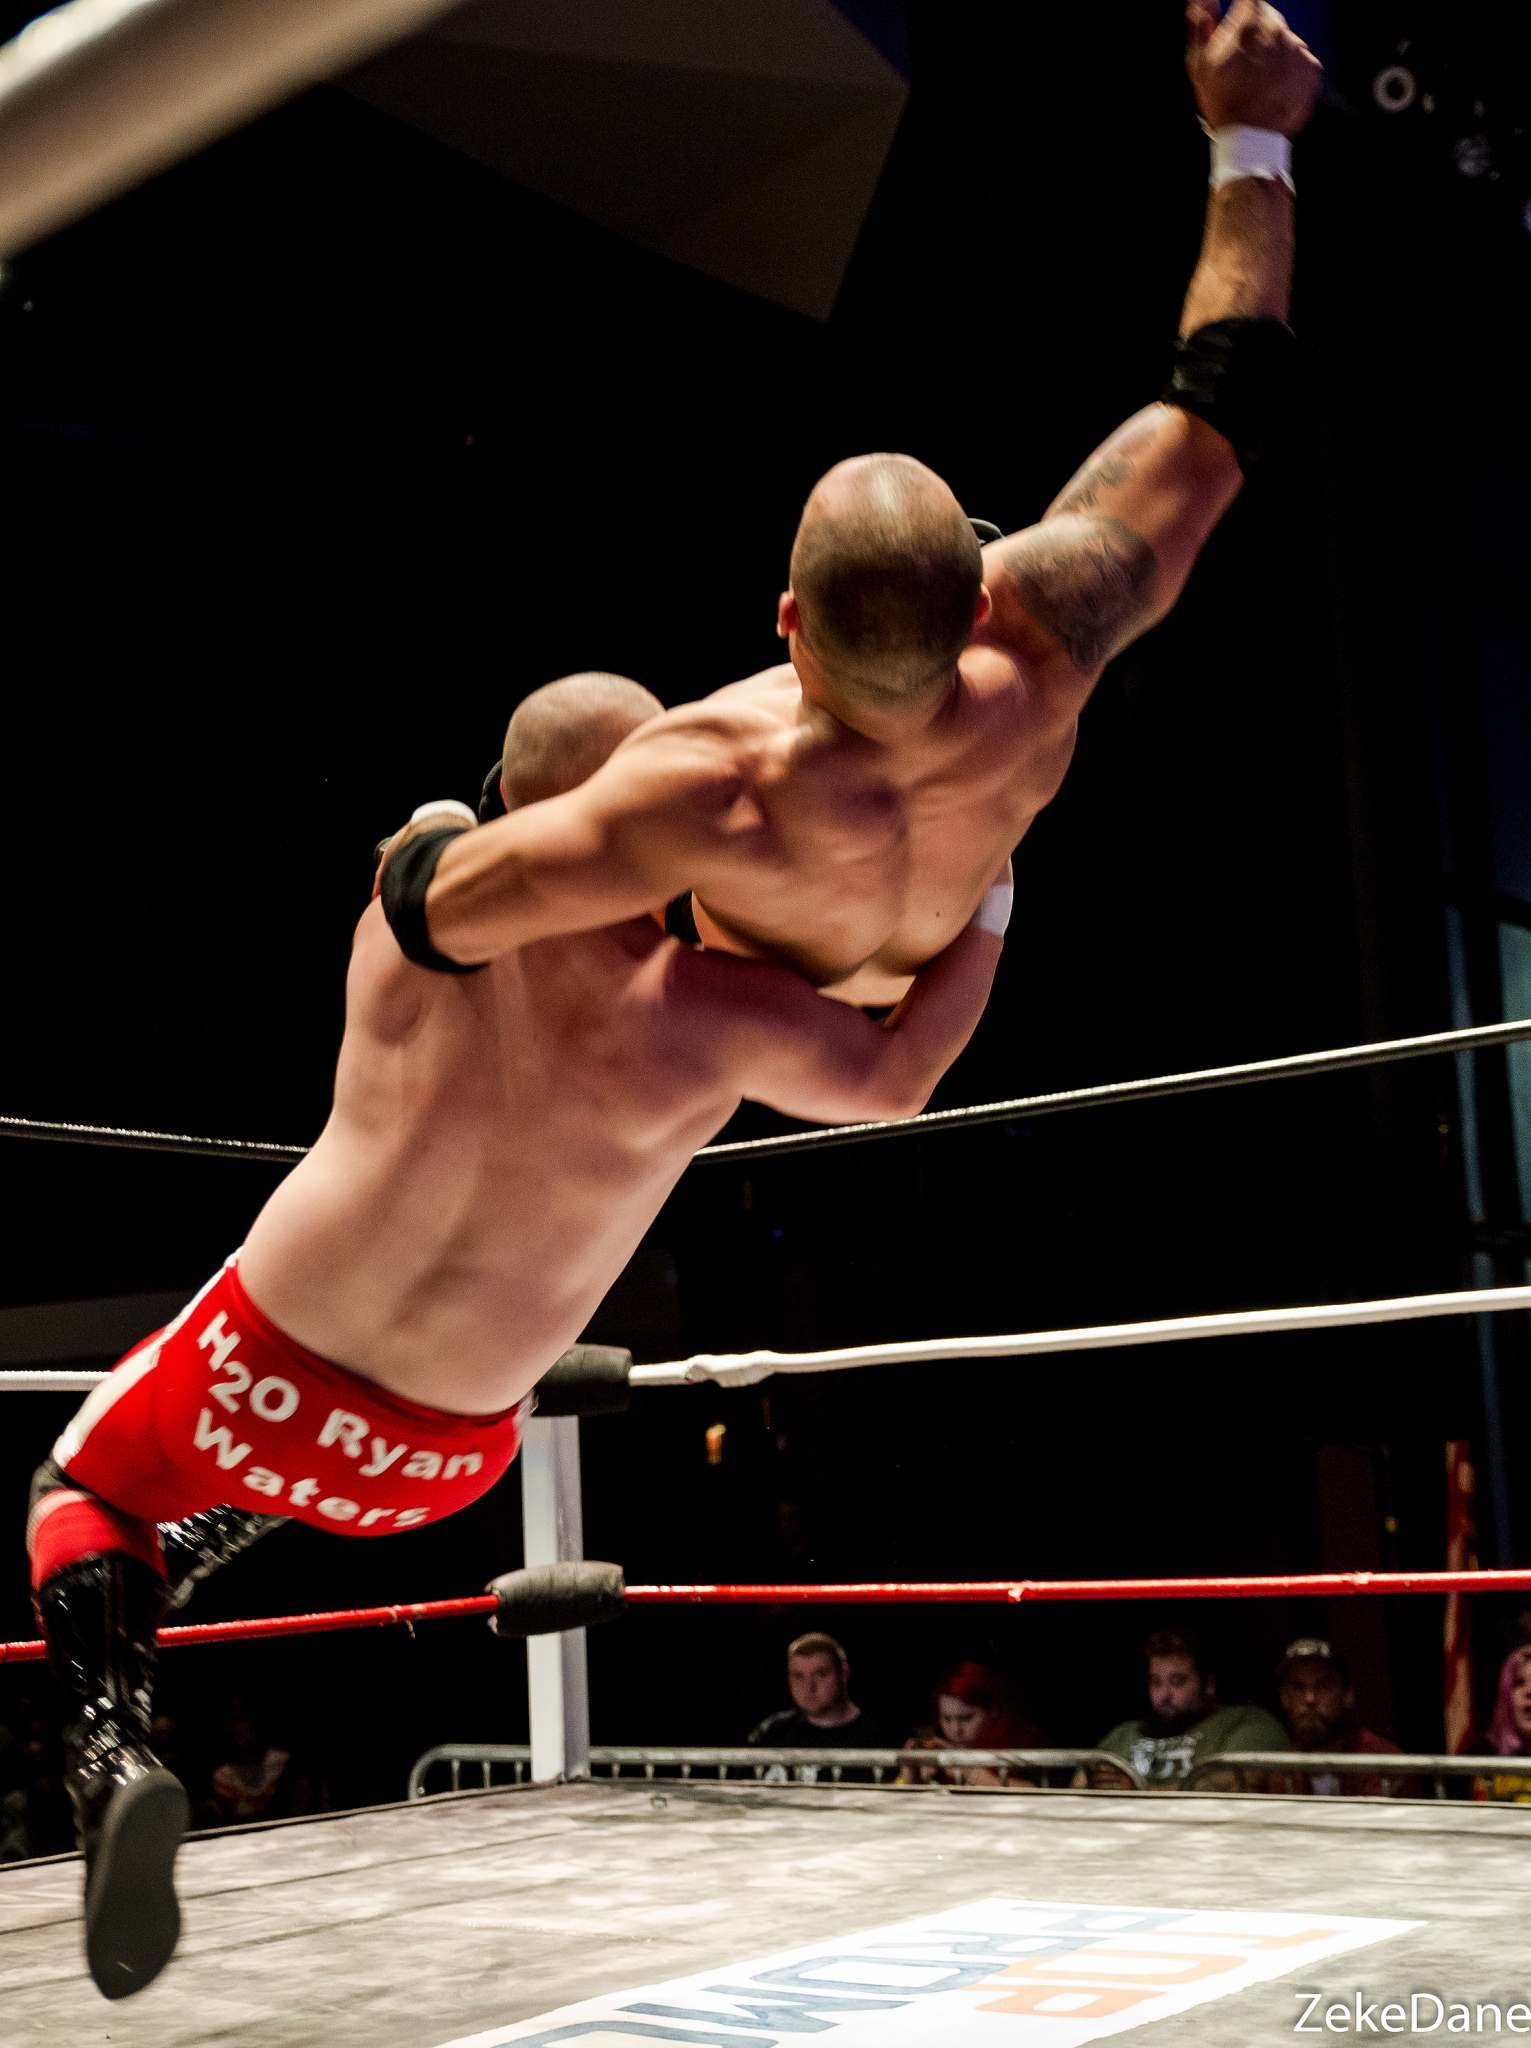 pro wrestling3 Pro Wrestling in New England 2016